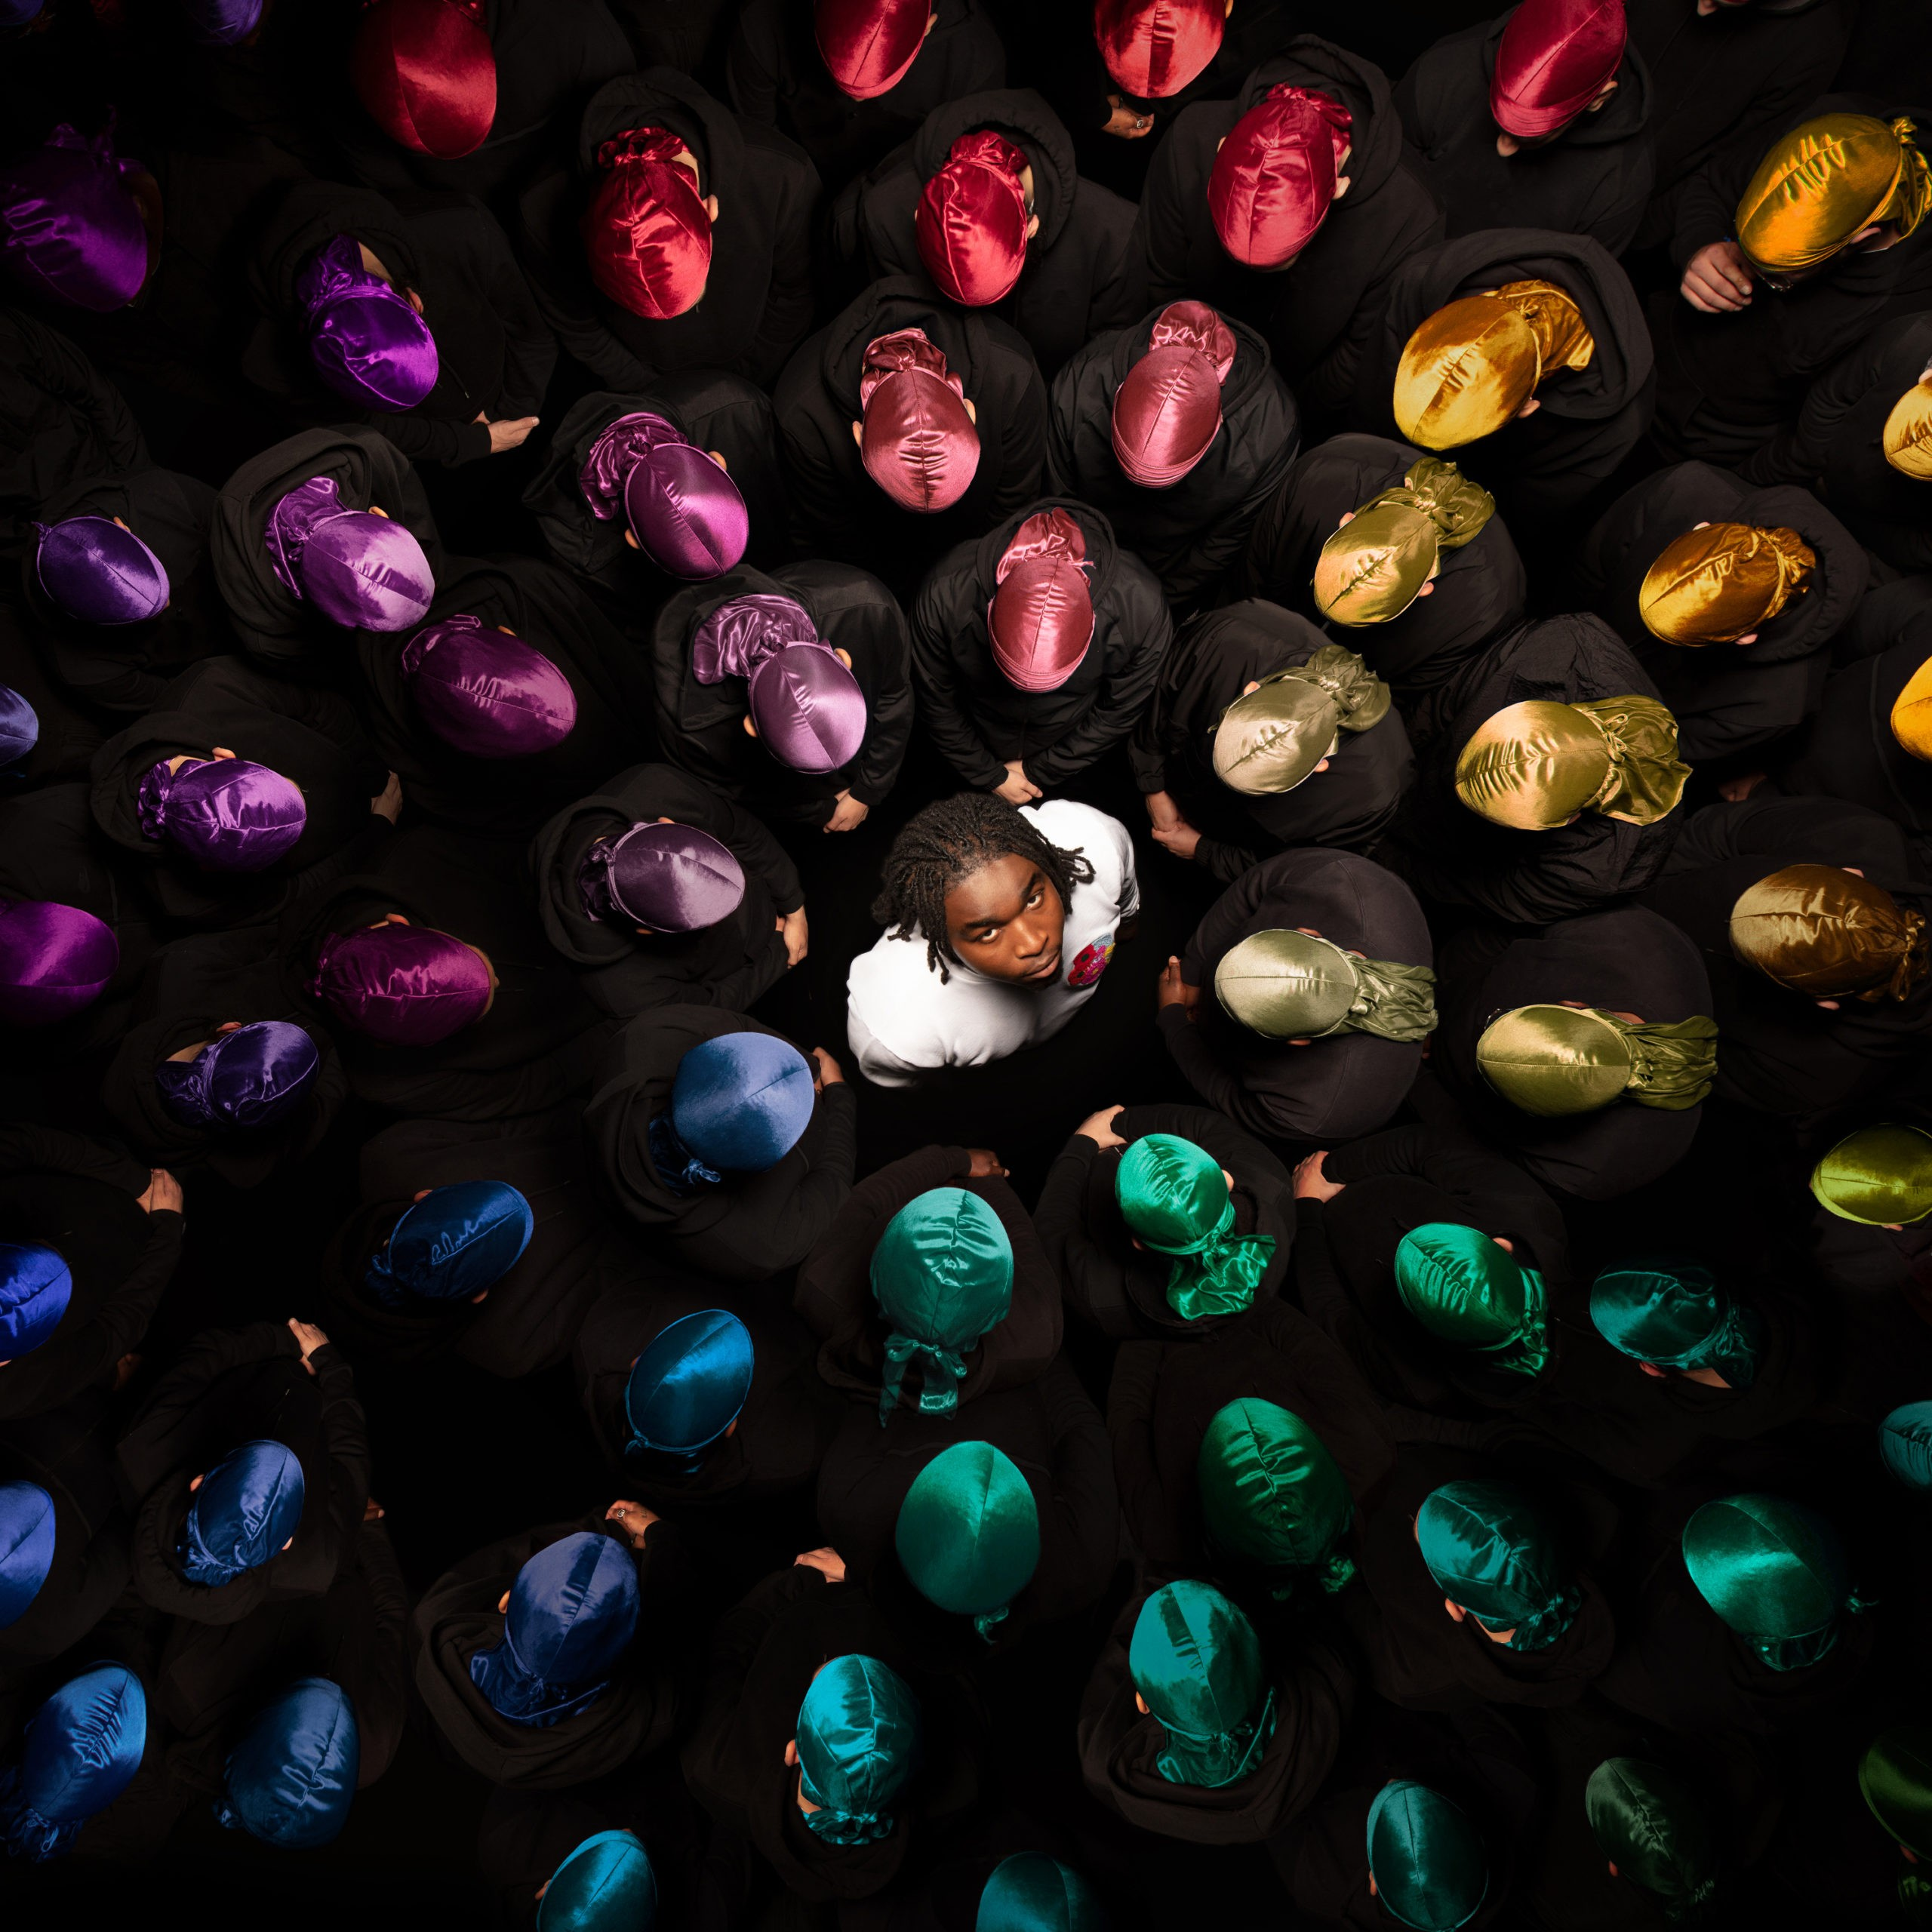 frenetik - couleurs du jeu